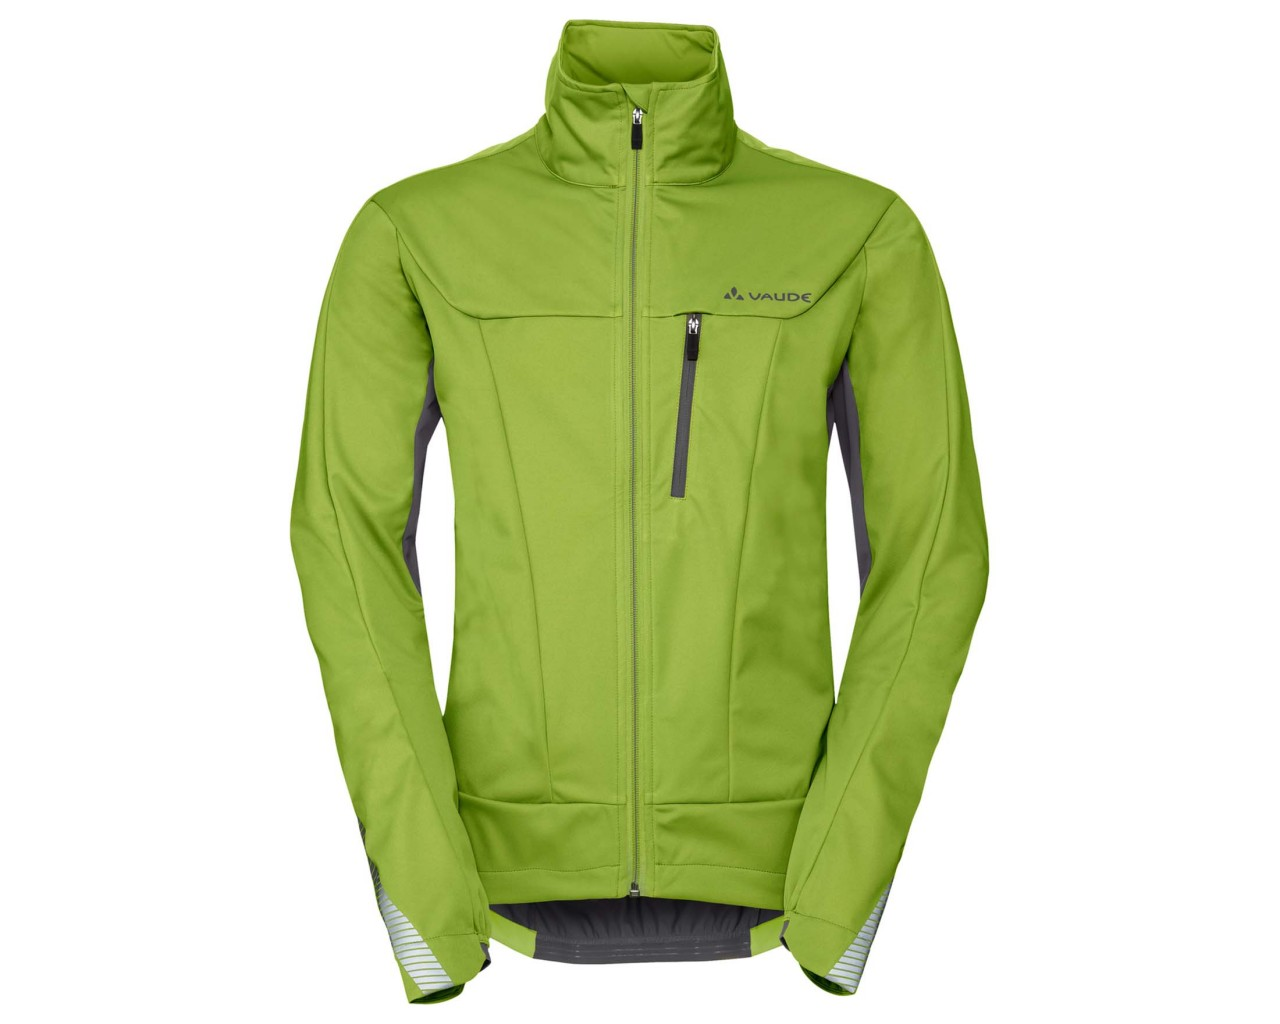 Vaude Steglio Softshell Fahrrad Jacke   chute green